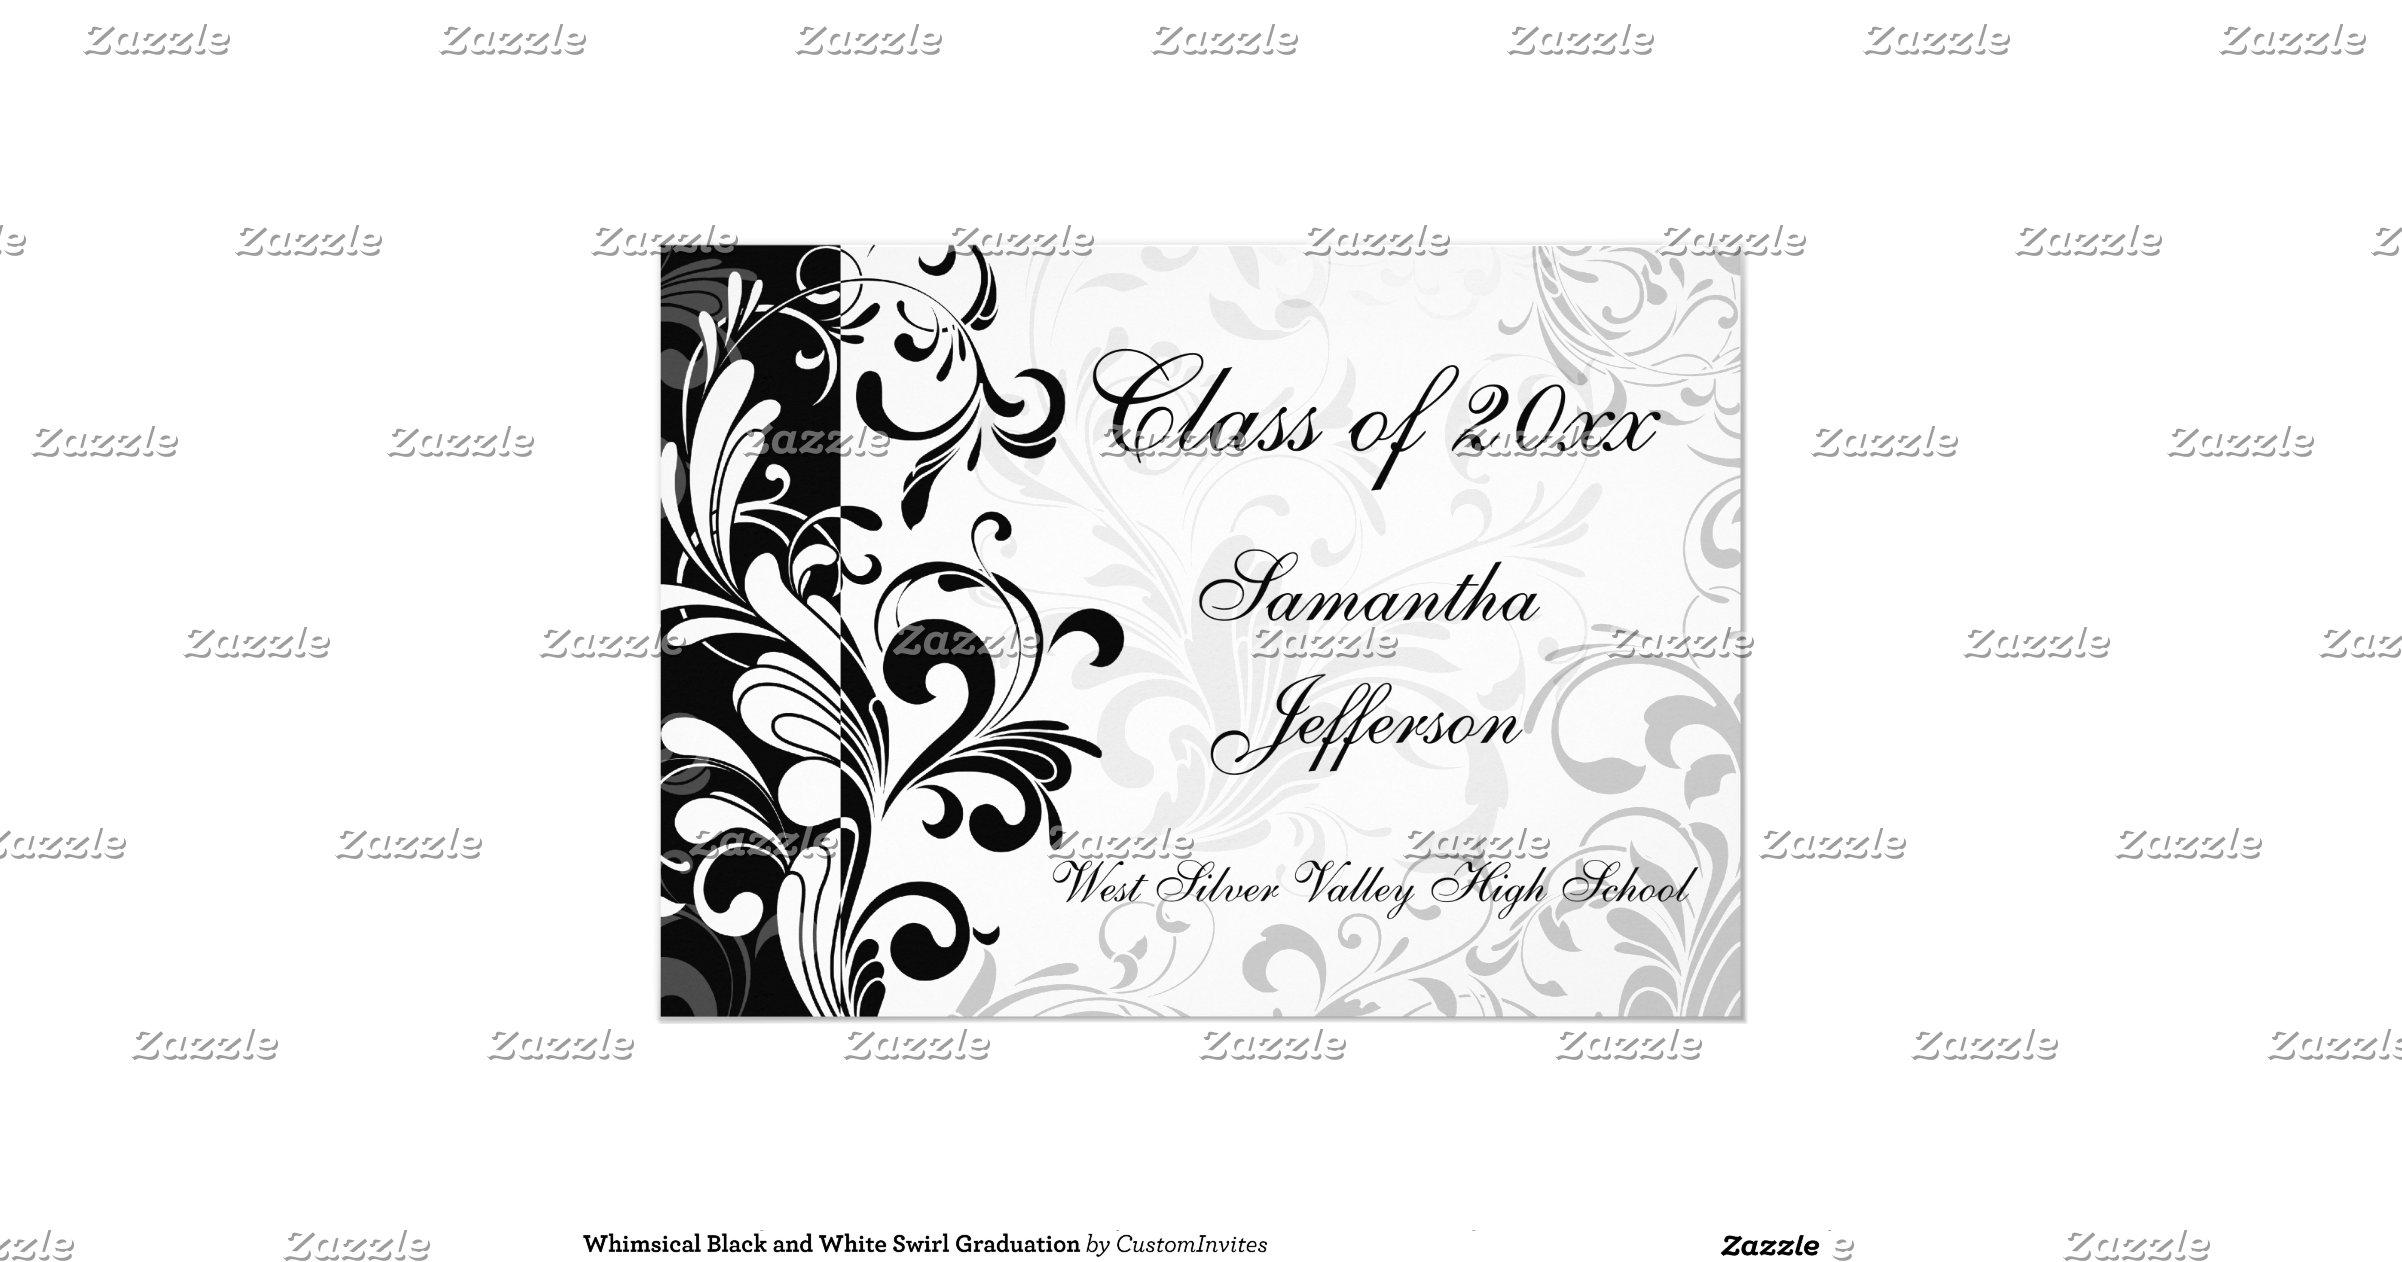 whimsical_black_and_white_swirl_graduation_5x7_paper